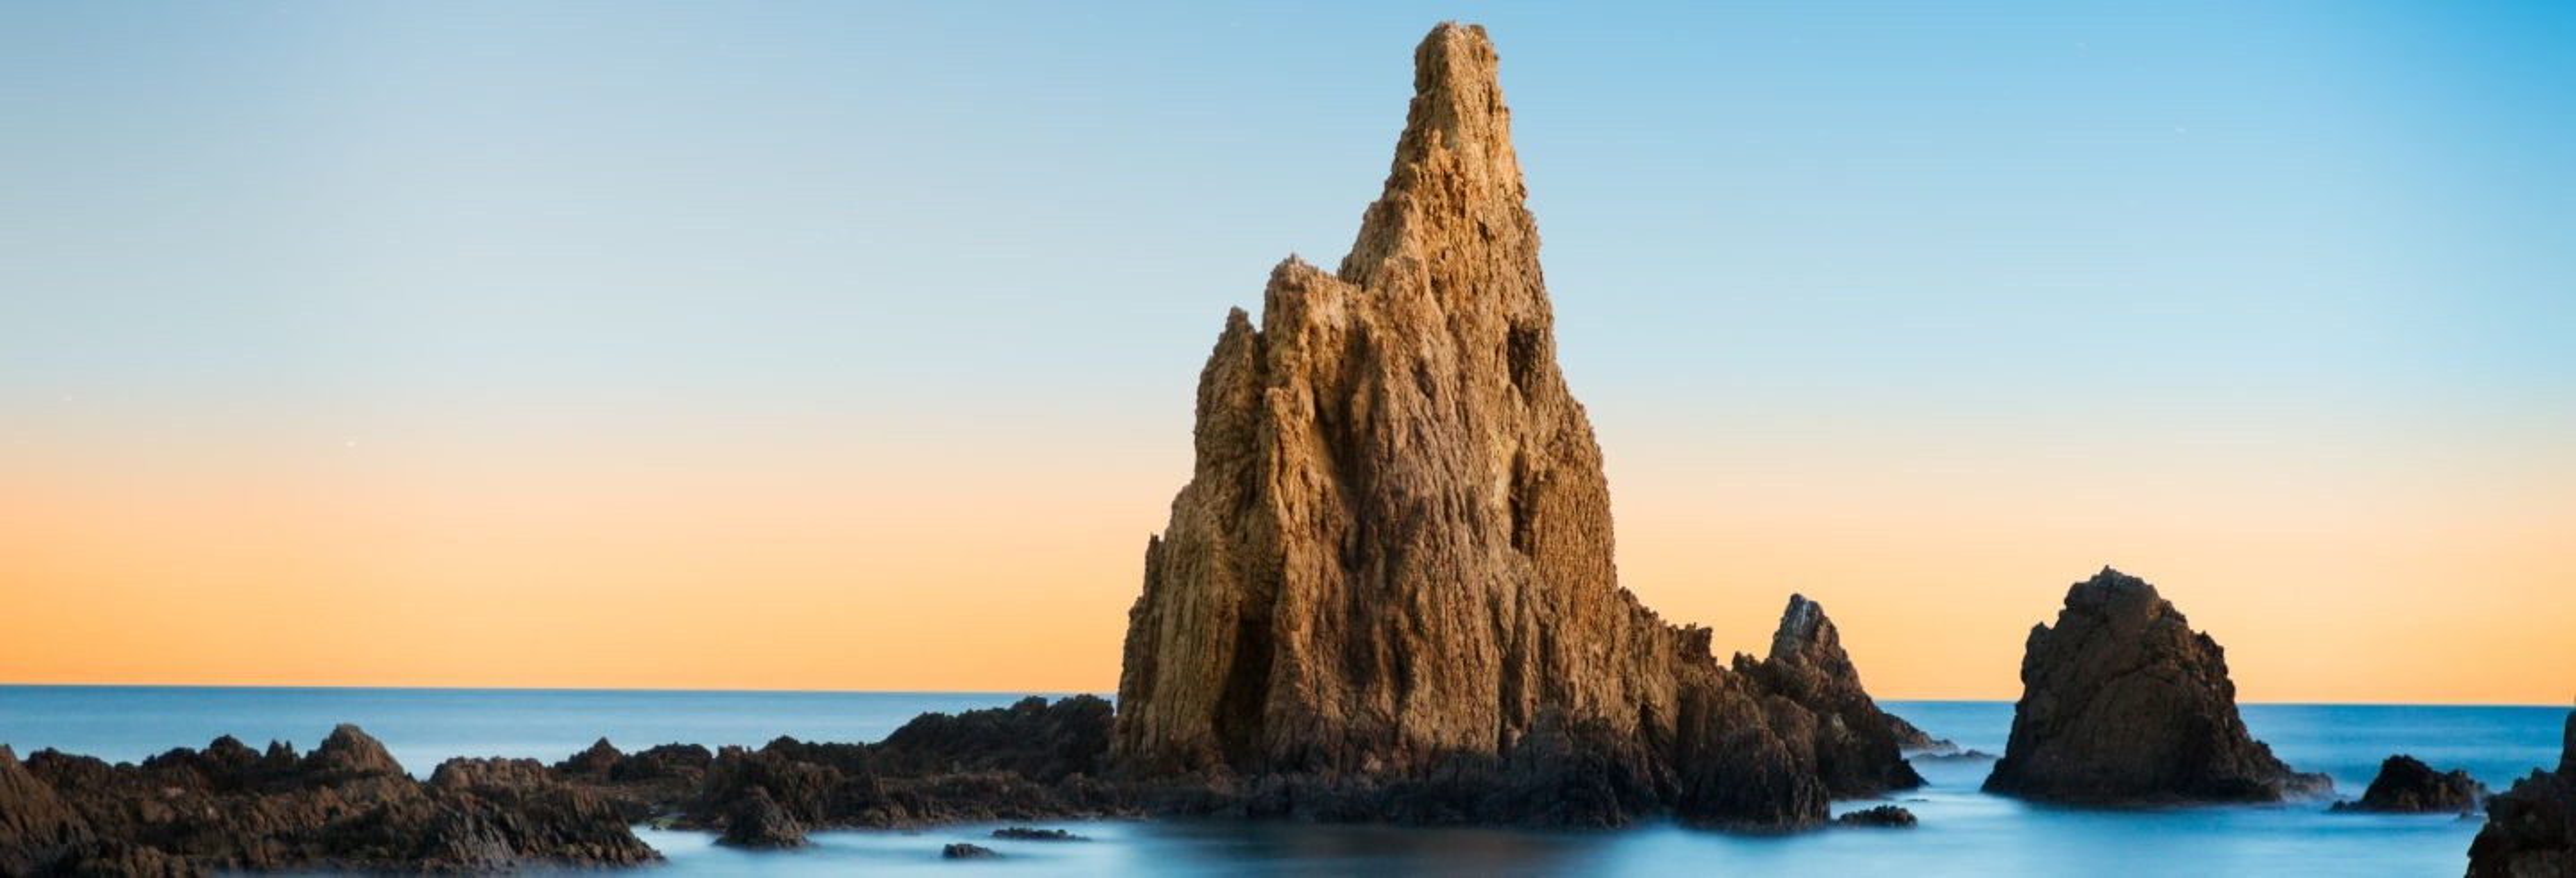 Excursión al Parque Natural Cabo de Gata